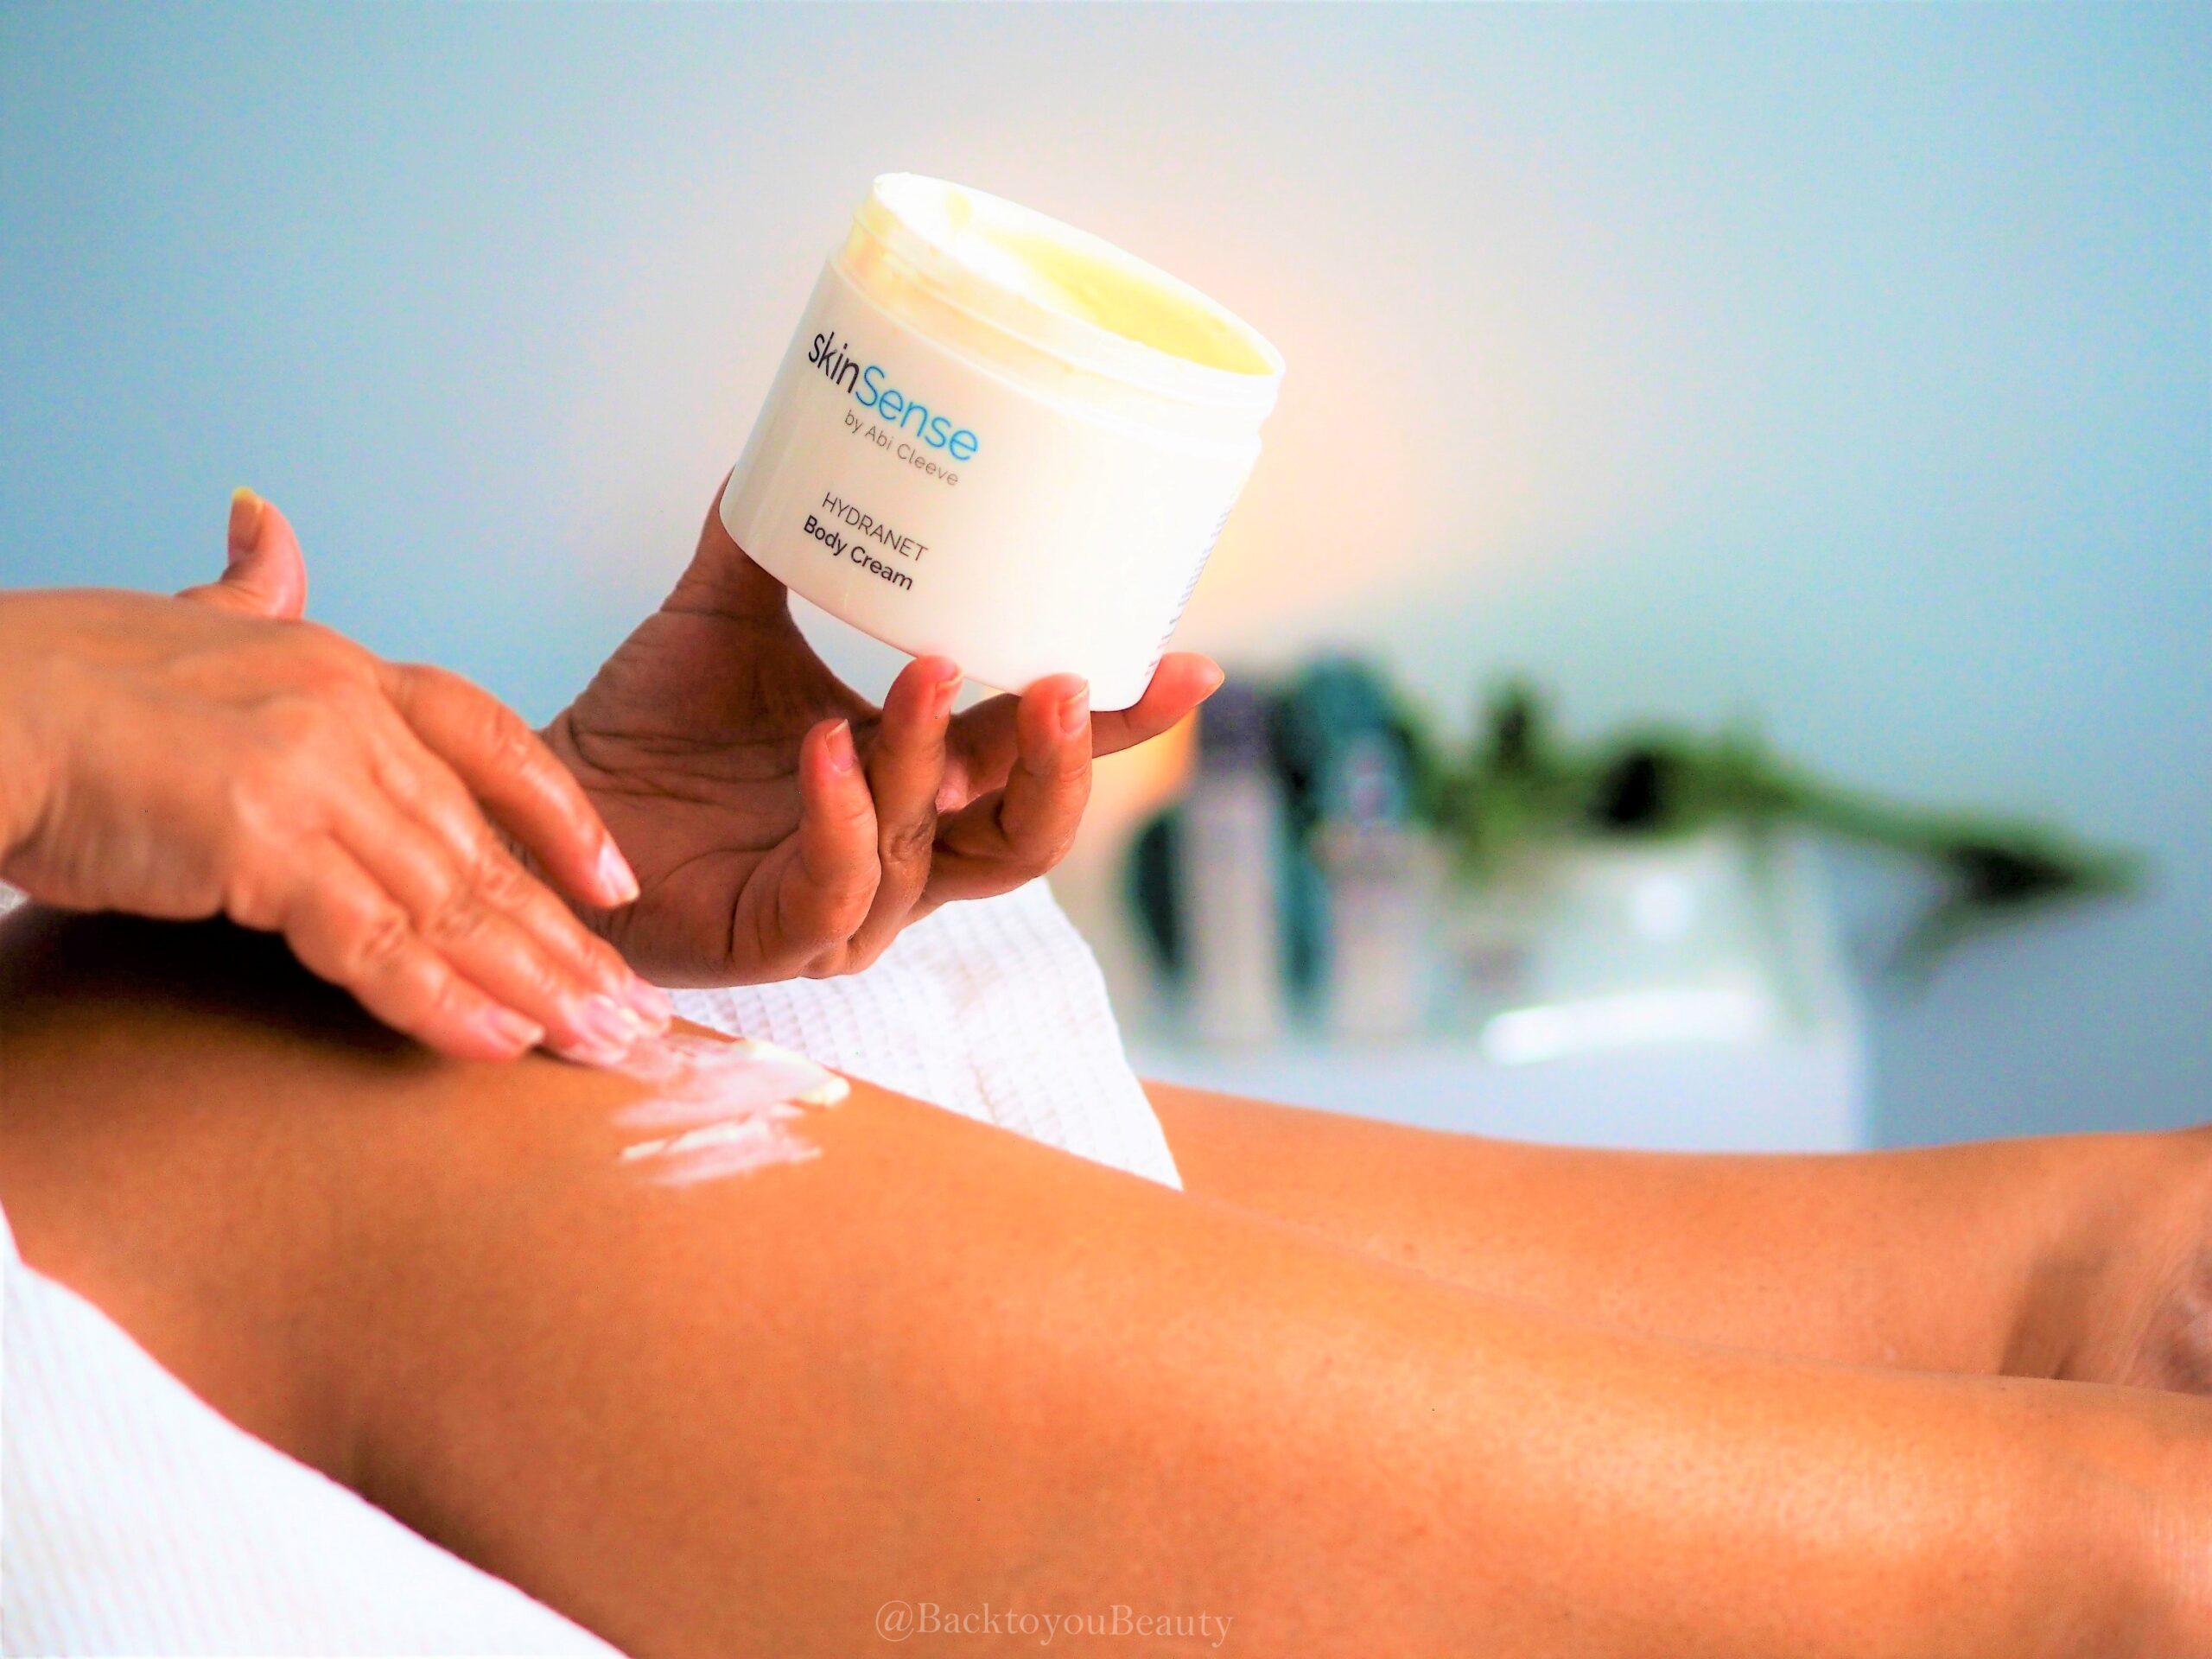 Applying Hydranet Body Cream to legs